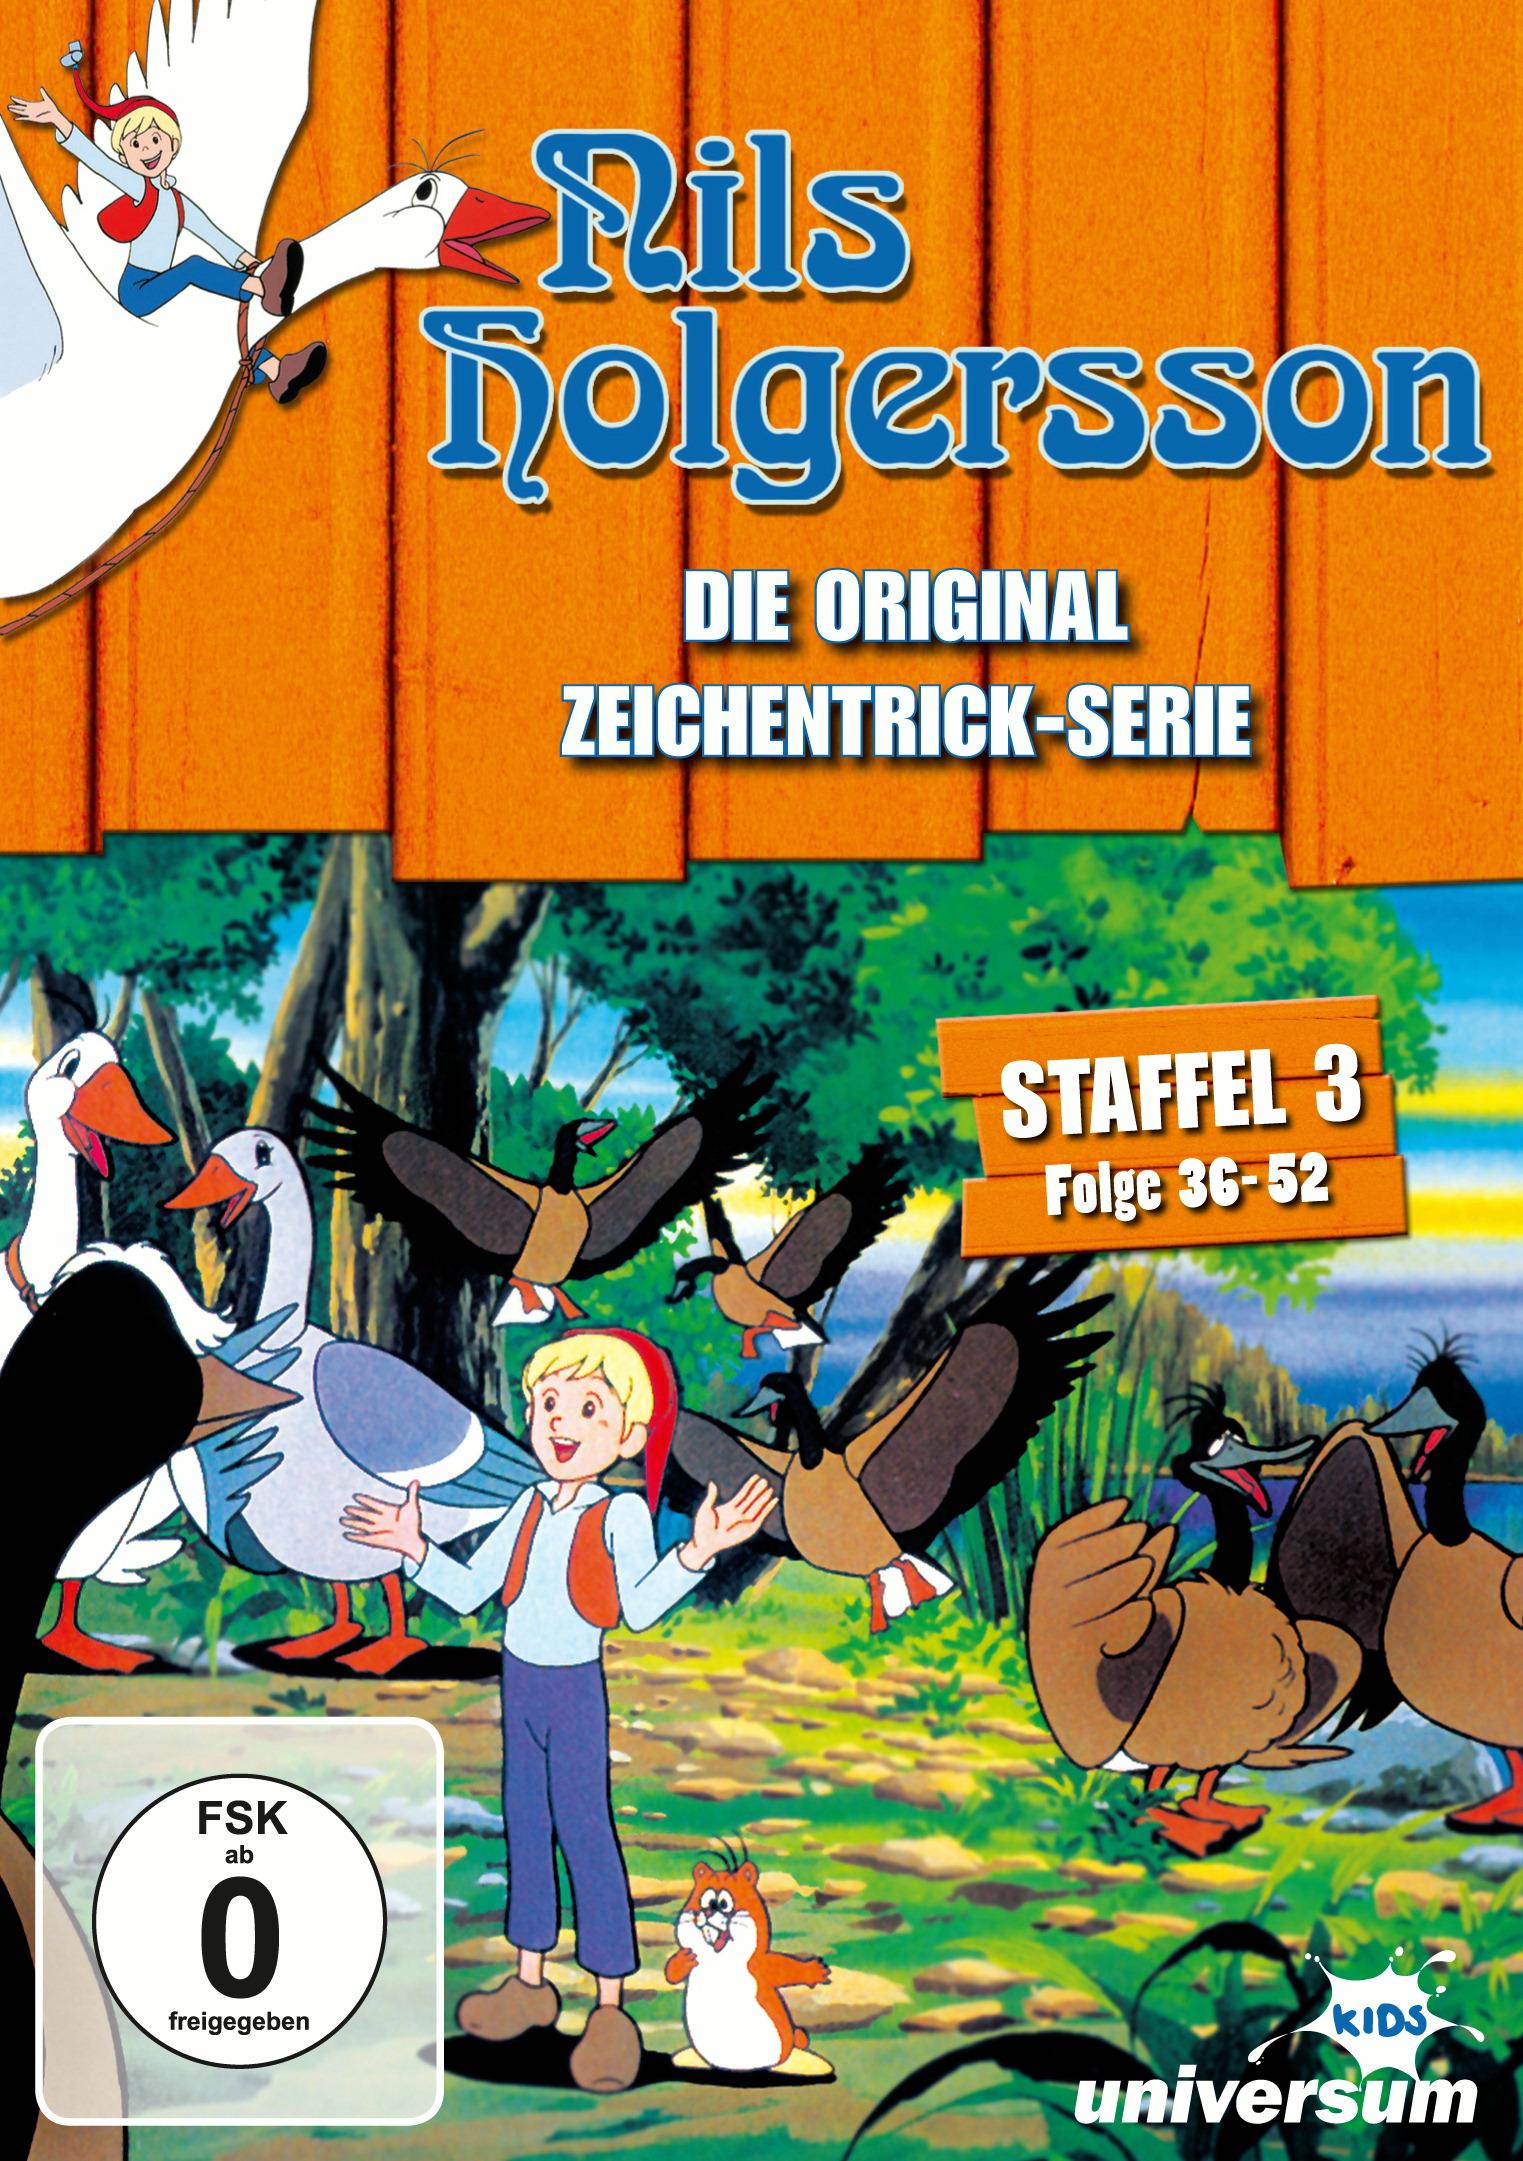 Nils Holgersson - Staffel 3 (3 Discs) Poster